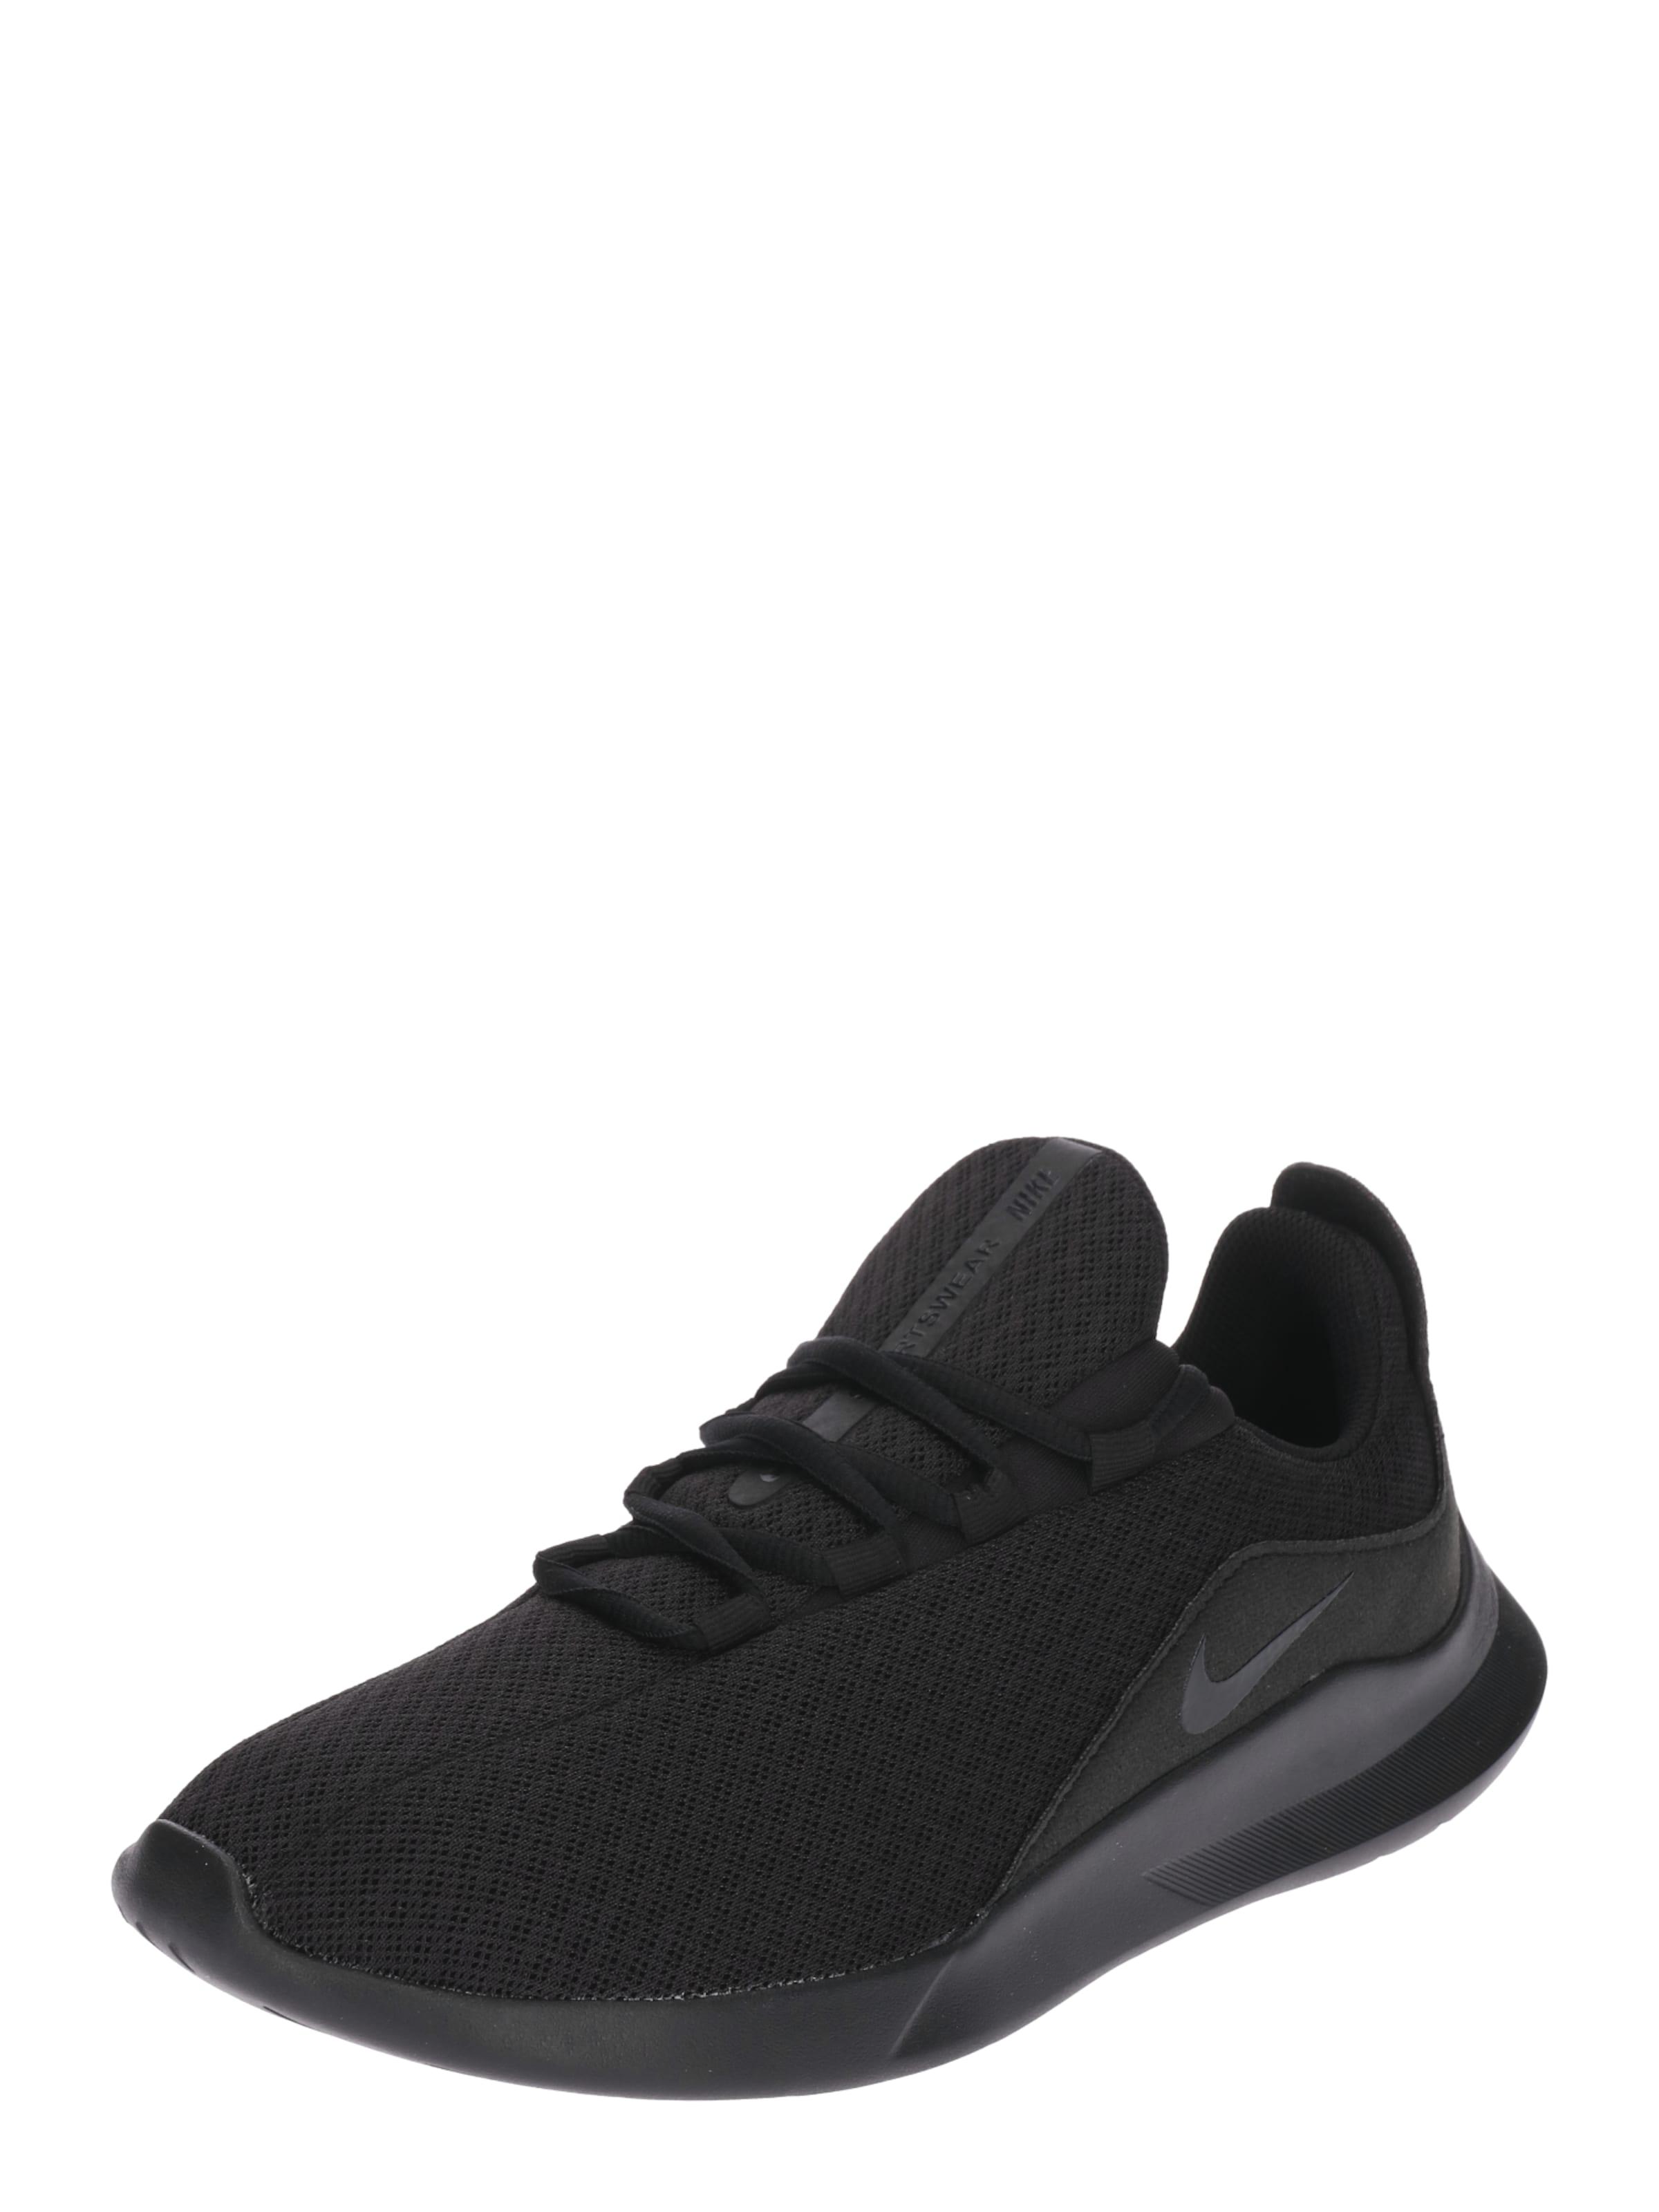 Nike Sportswear Sneaker Sneaker Sportswear Nike Viale Hohe Qualität 4da6d6